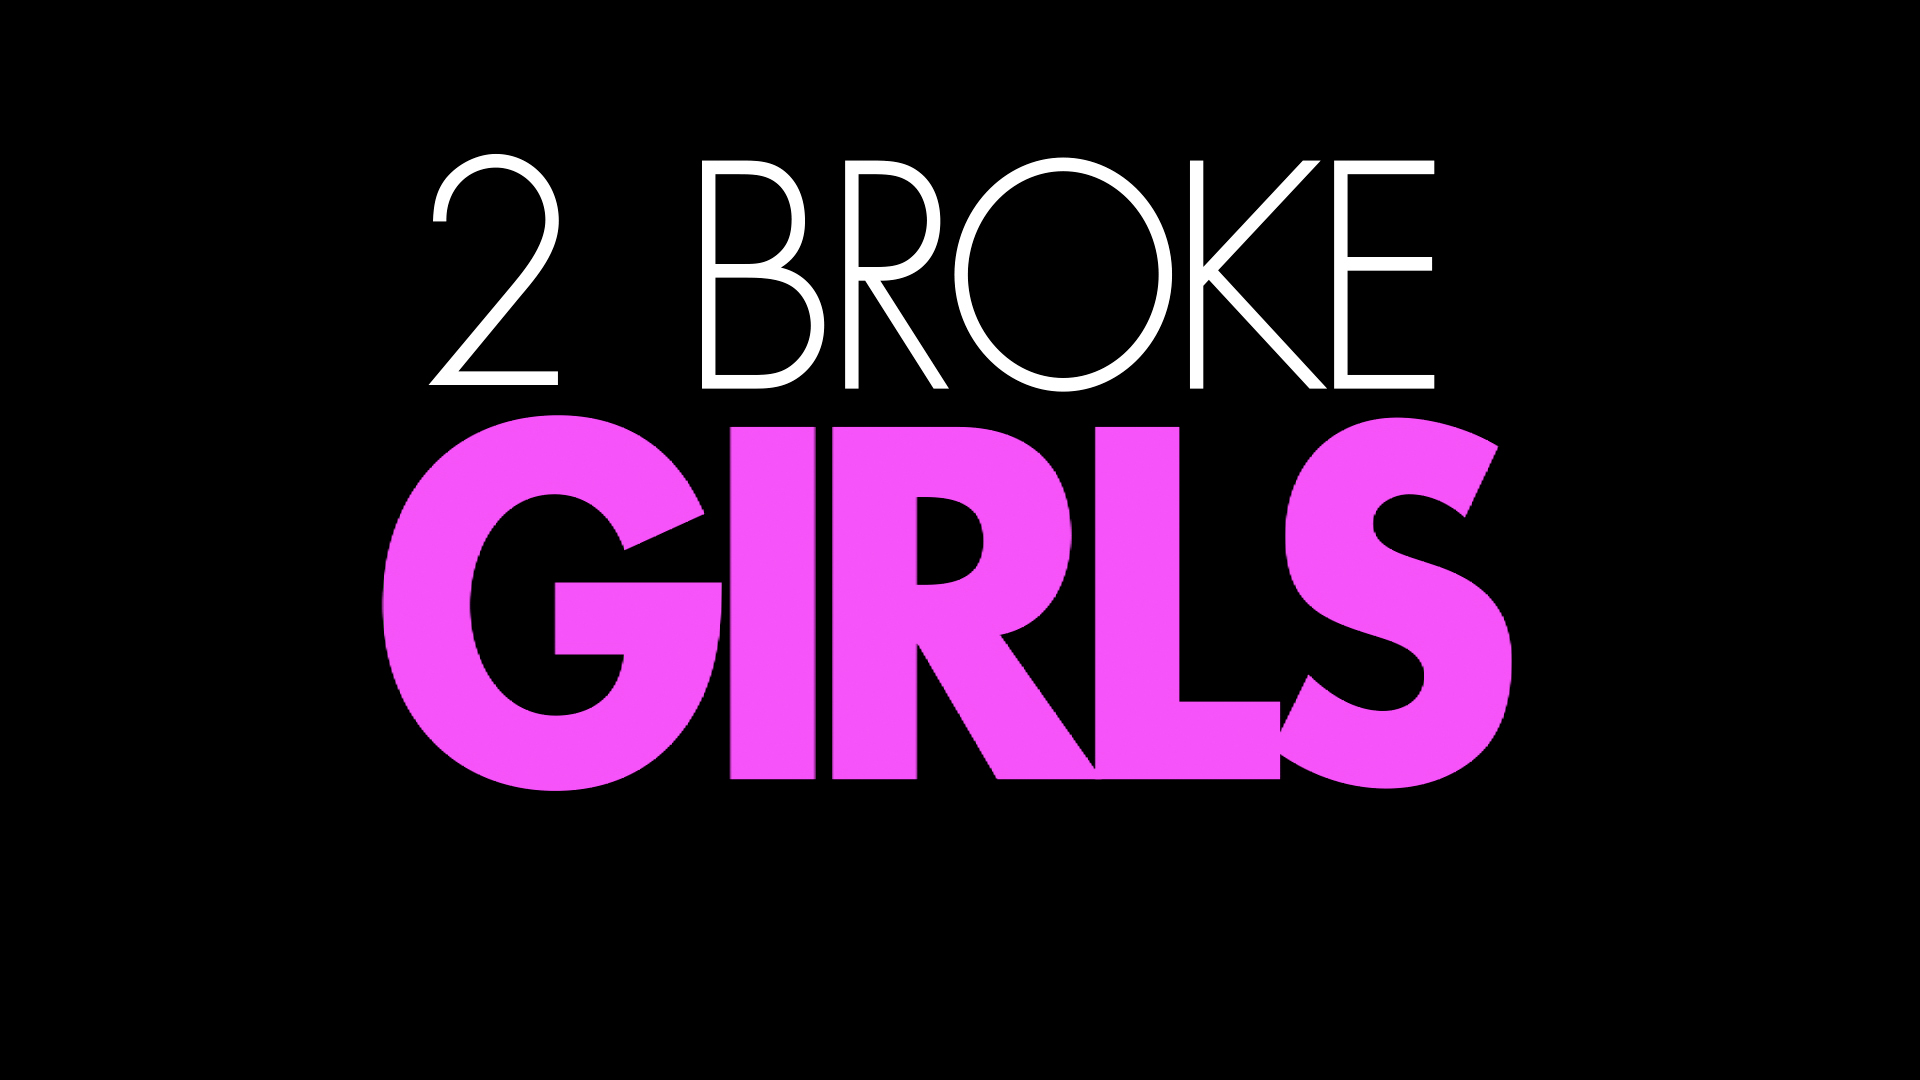 2 Broke Girls Titlecard